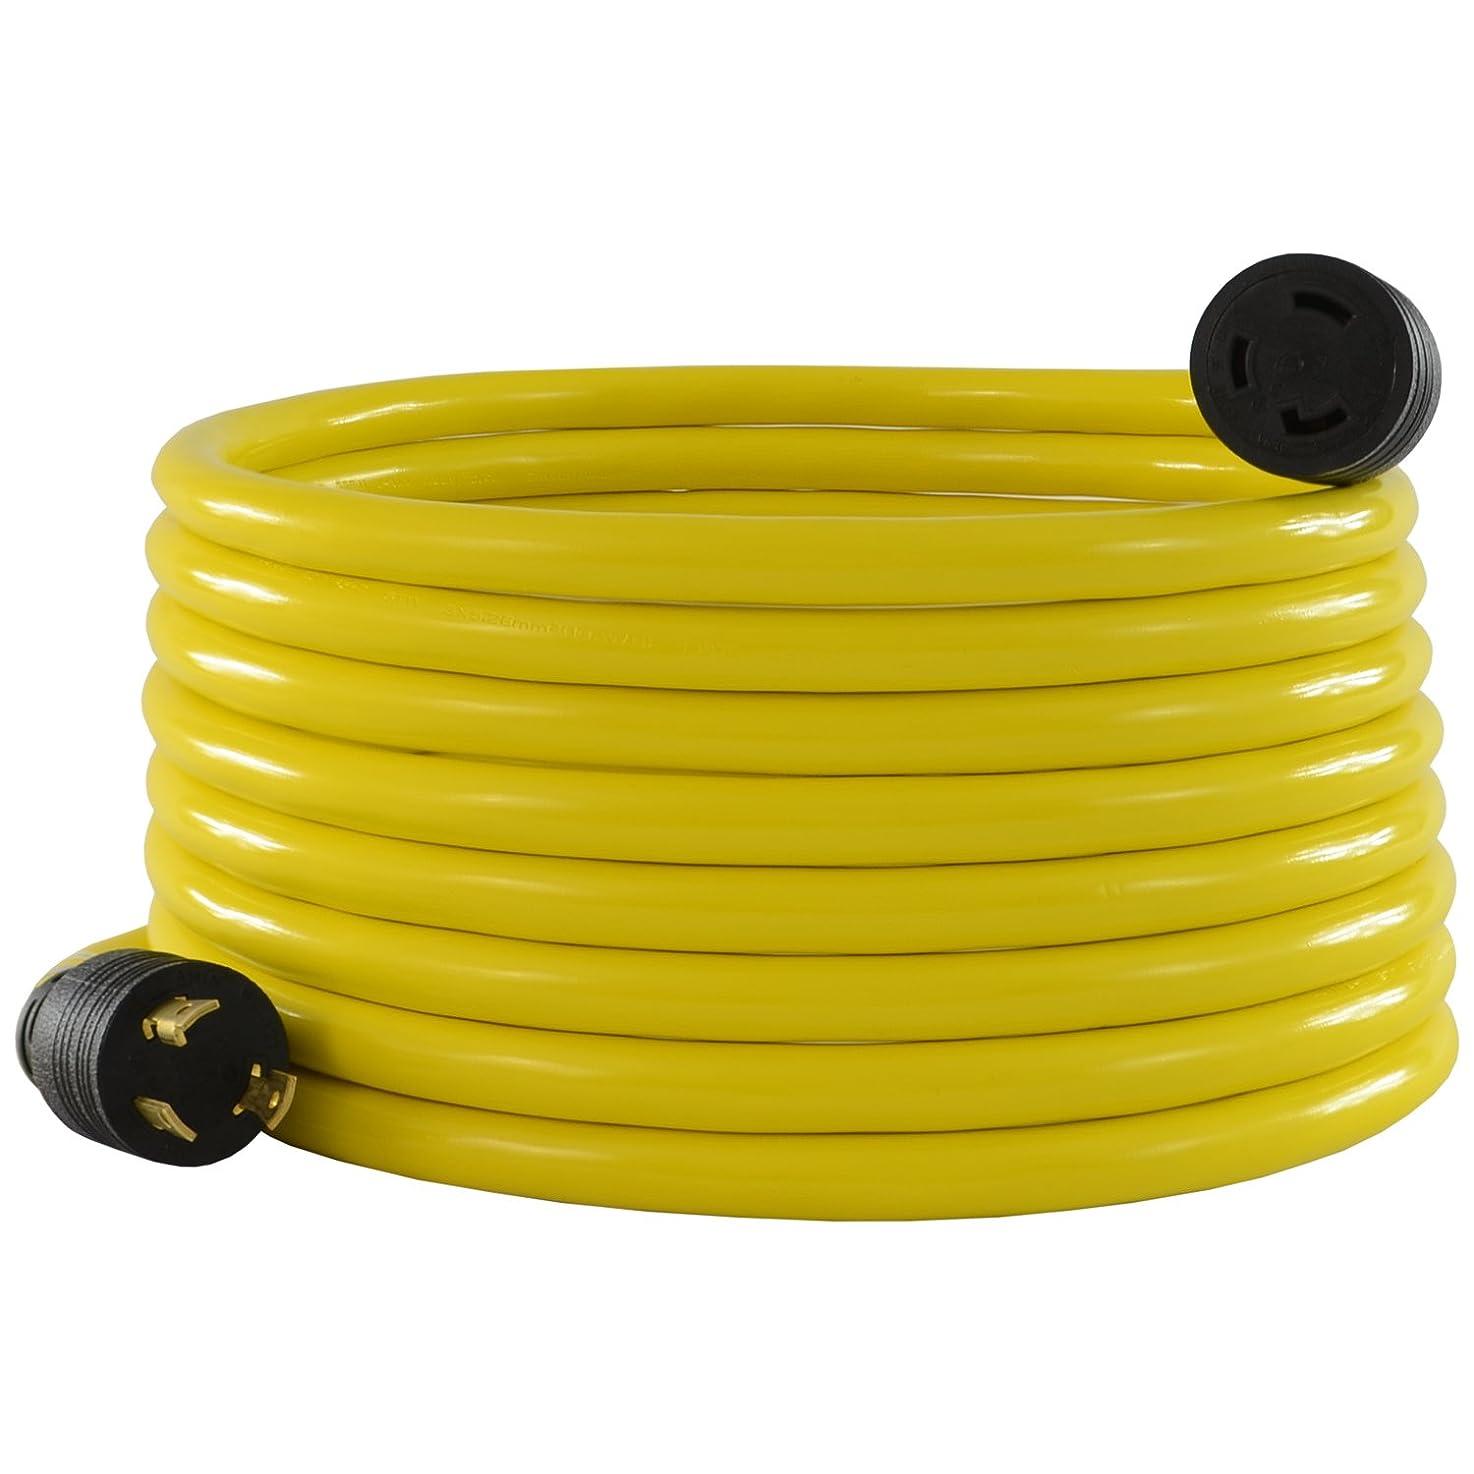 Conntek 20571: 30 Amp L5-30 Locking Style Generator Extension Cord, 25 Feet